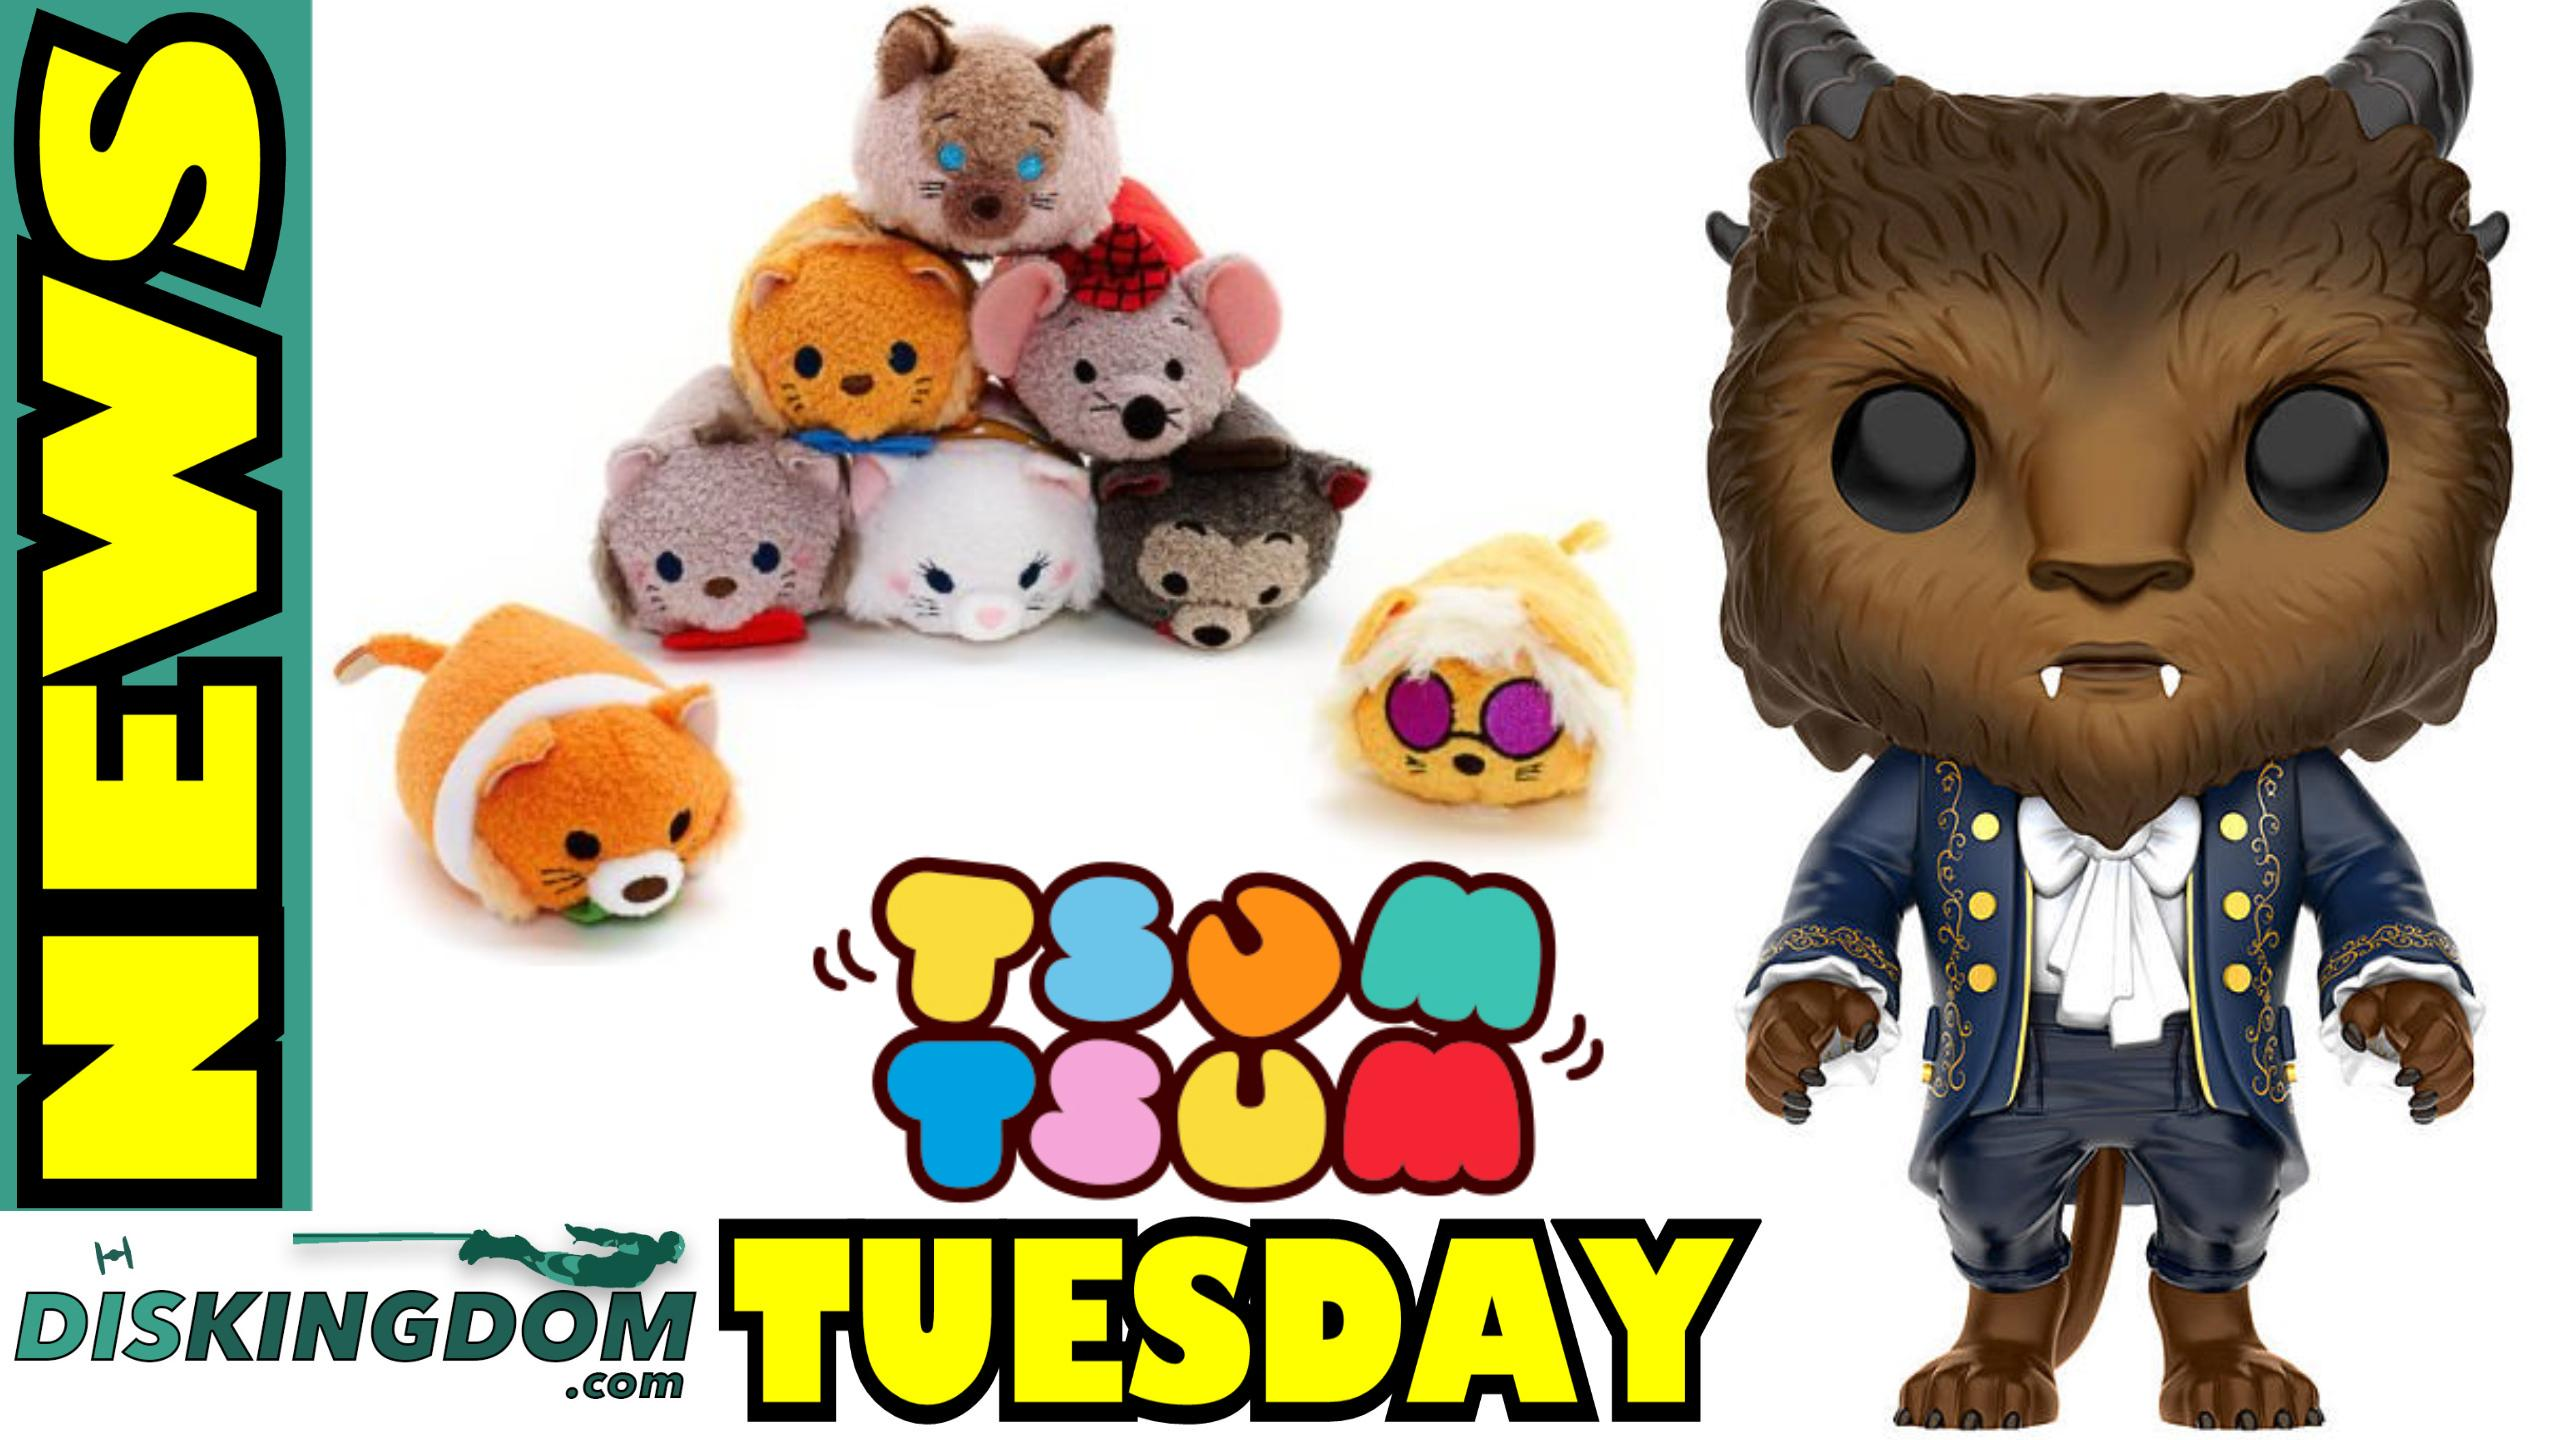 Tsum Tsum Tuesday + Beauty & The Beast Pop Vinyls Coming Soon | DK Disney News